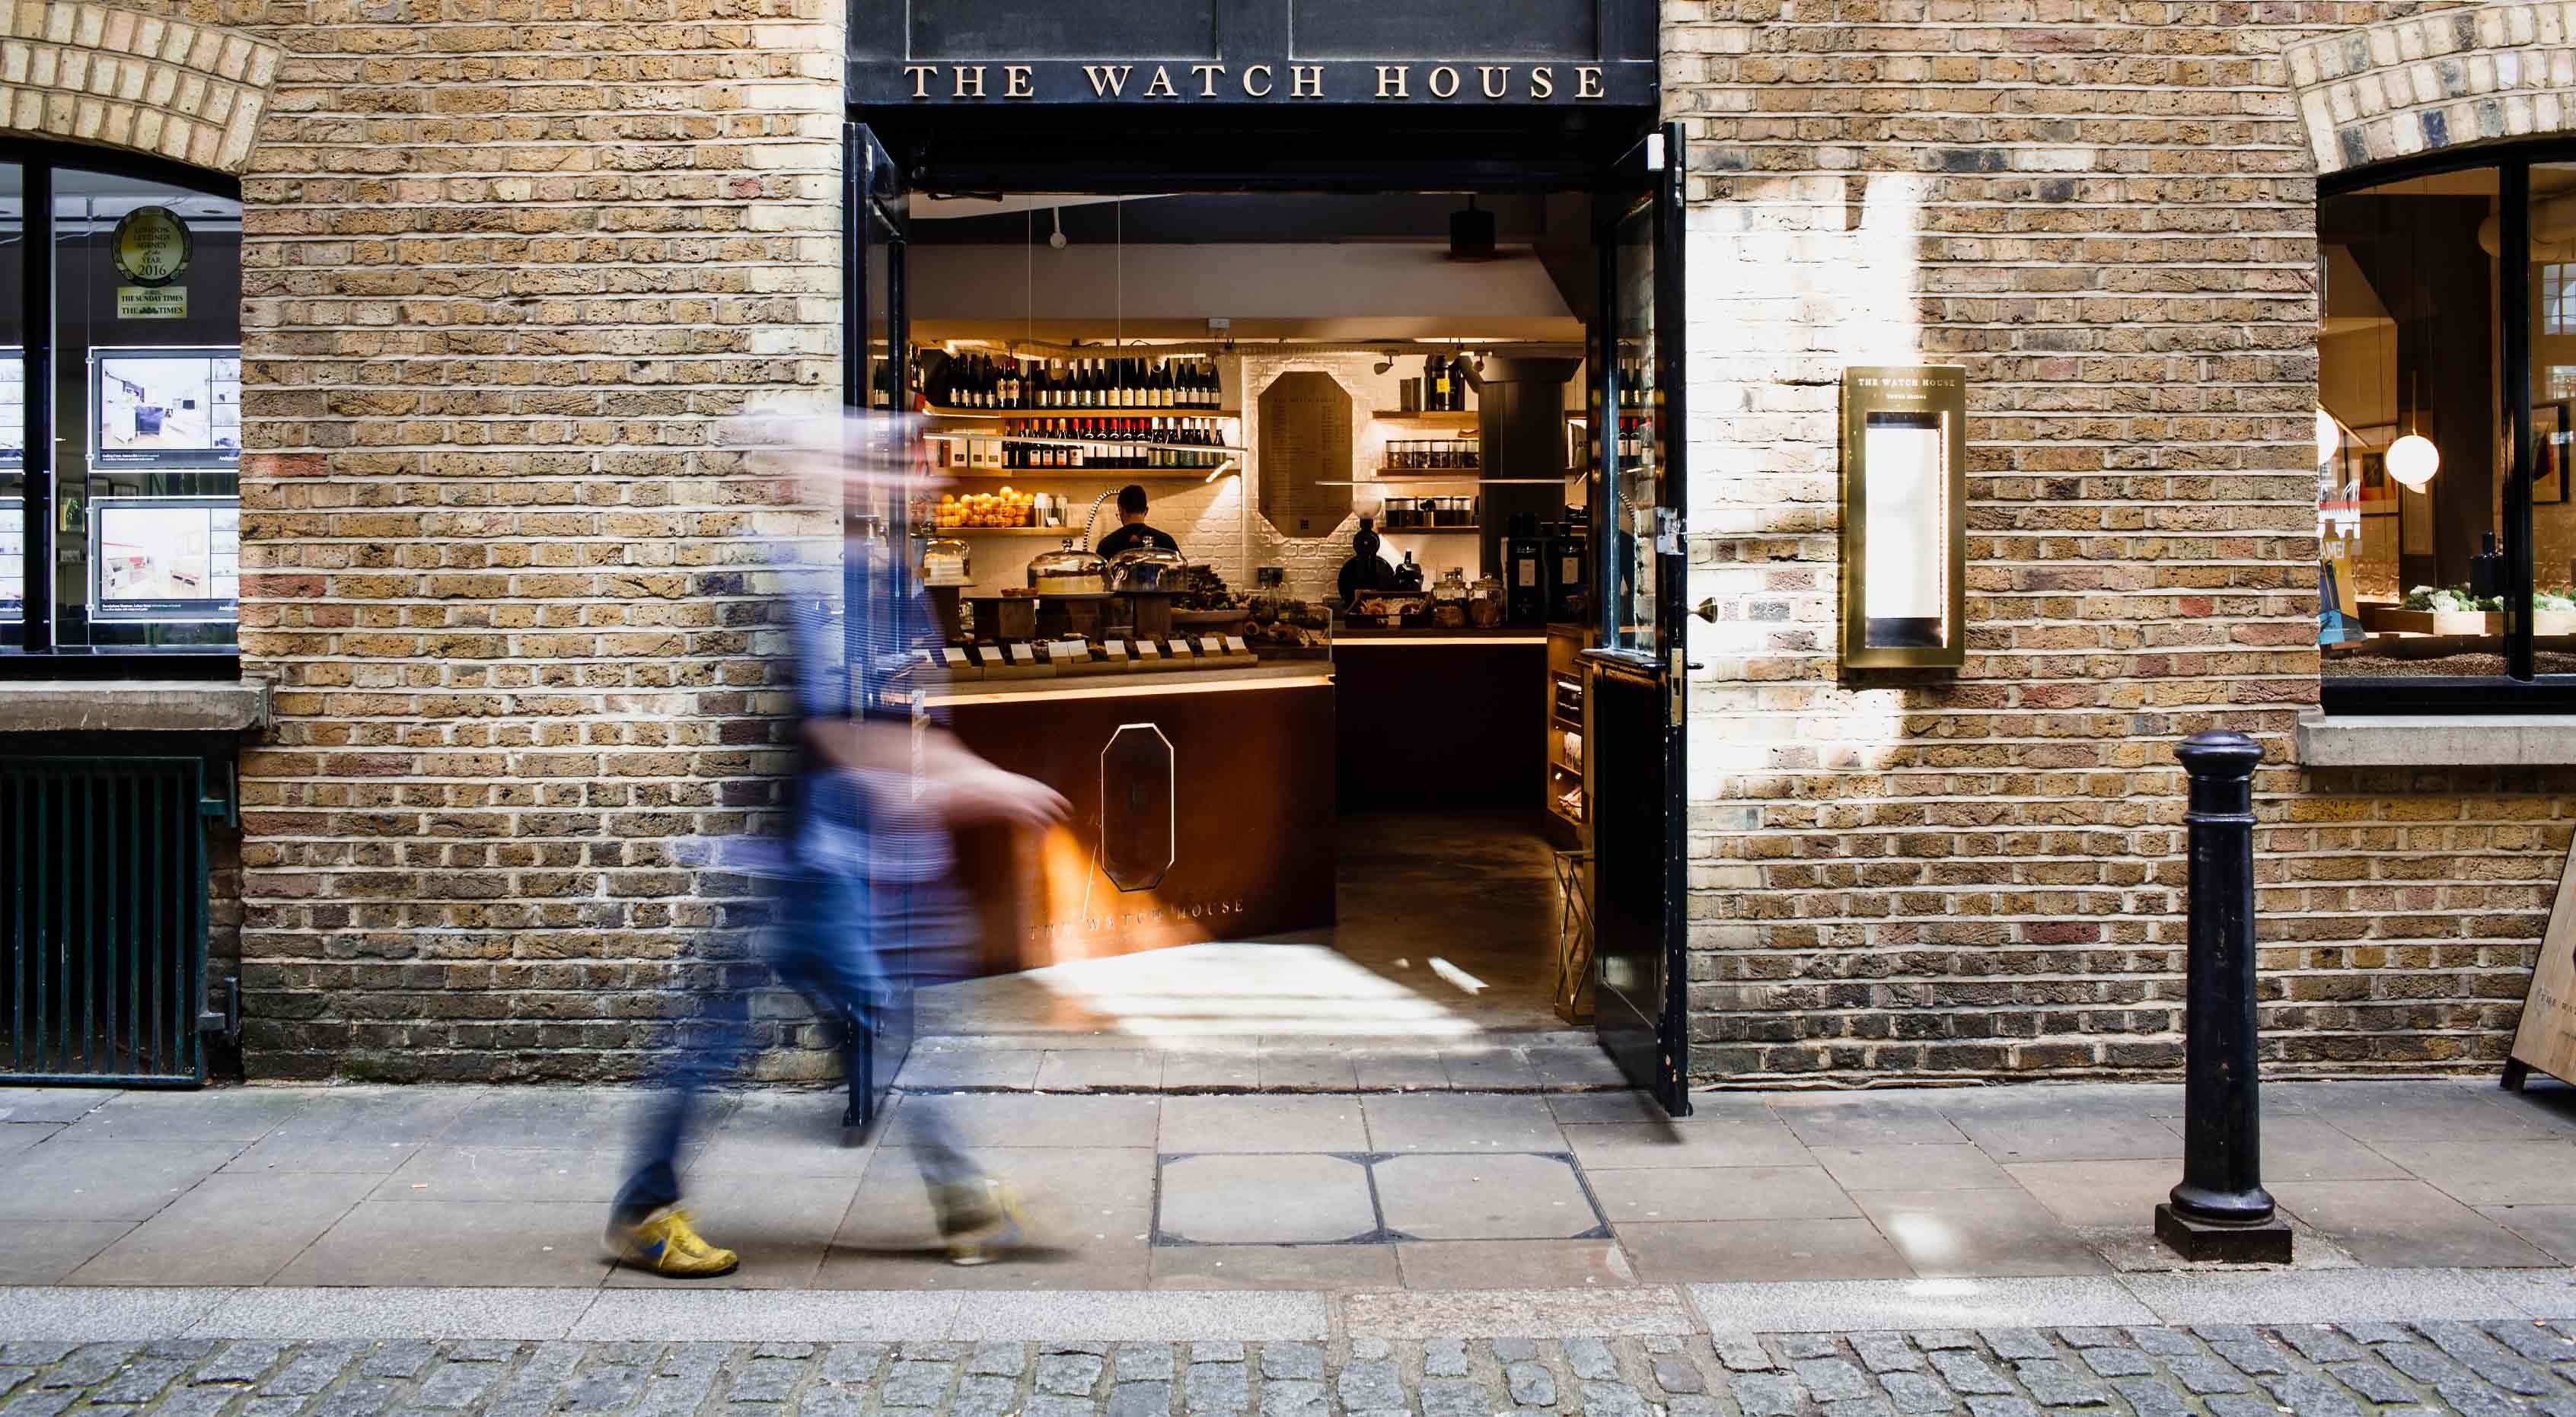 somewhere-little-london-watch-house